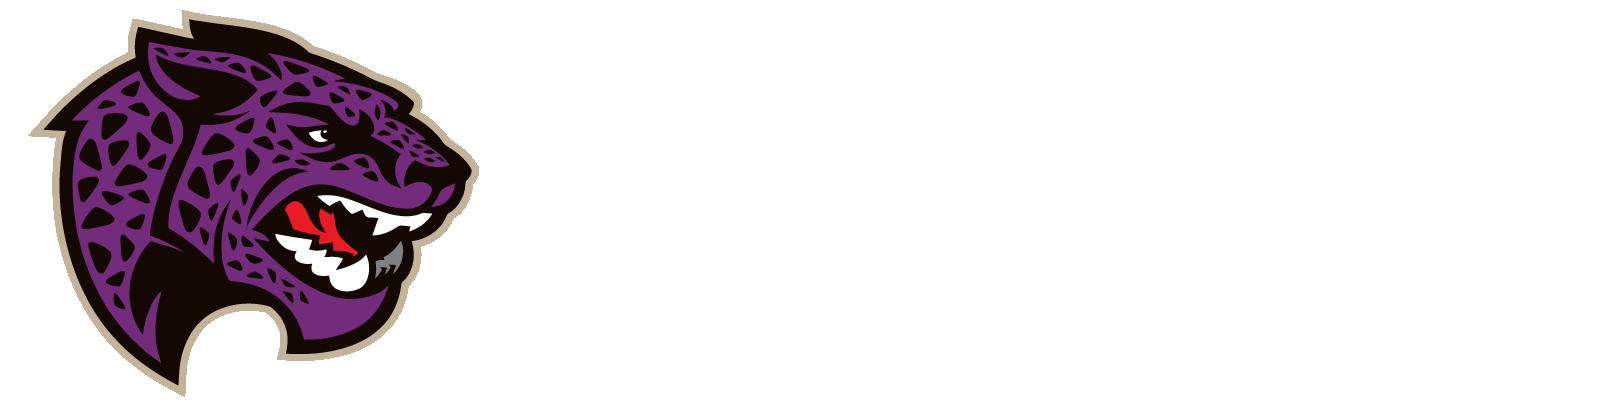 LBJ image